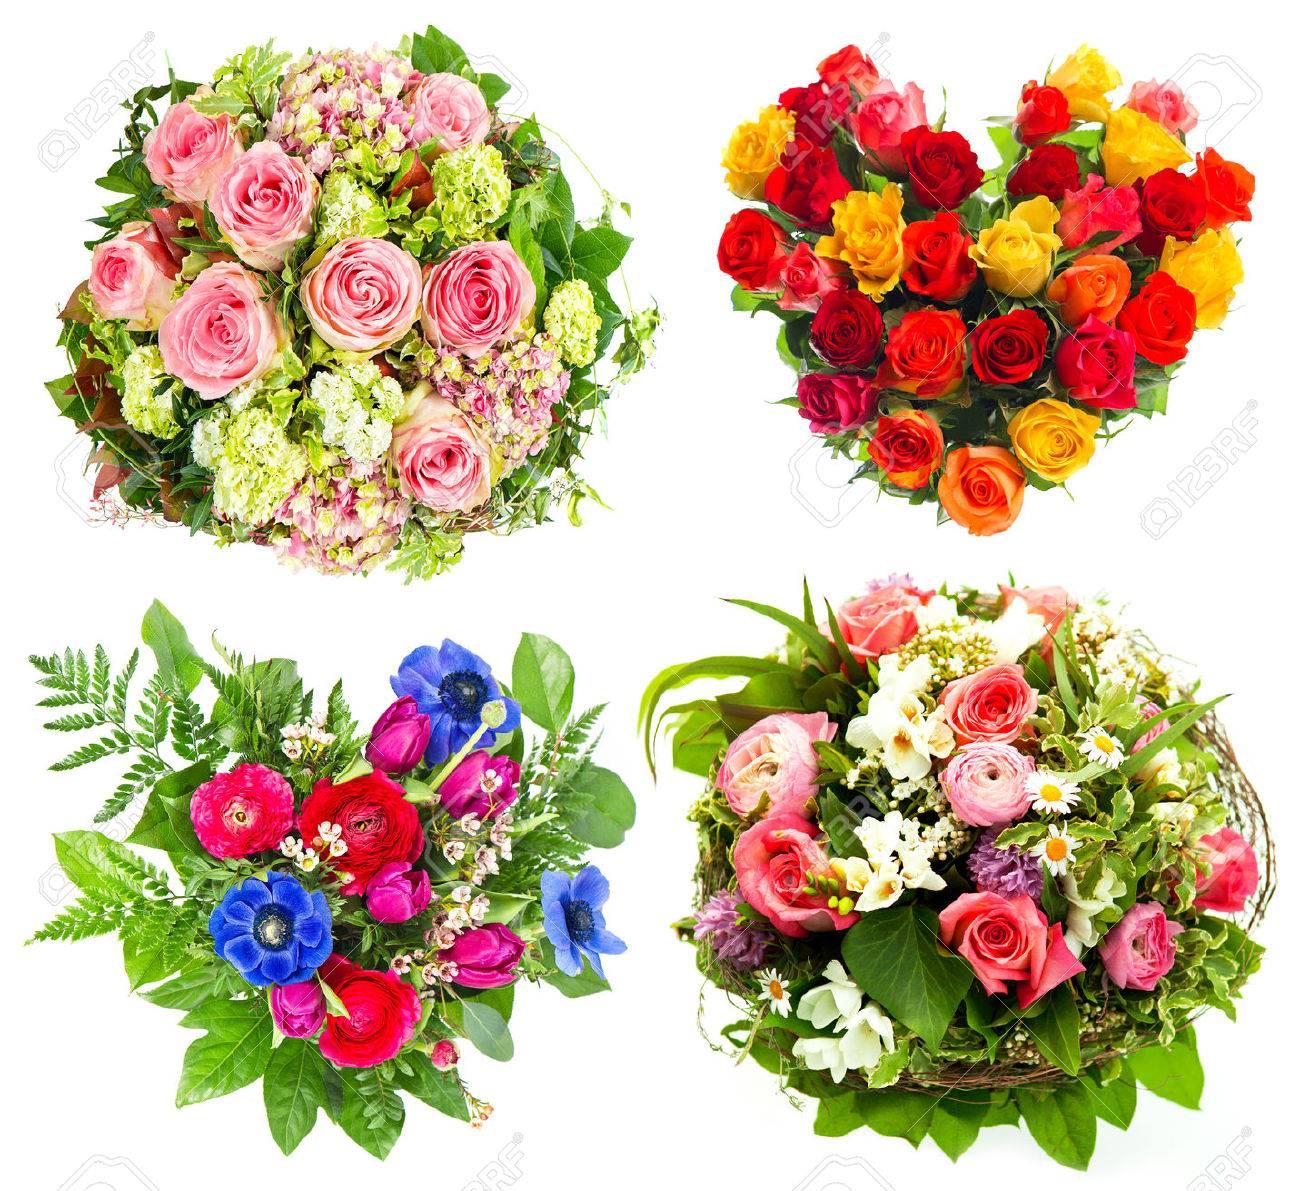 Four colorful flowers bouquet for birthday wedding mothers stock four colorful flowers bouquet for birthday wedding mothers day valentines day roses arrangement izmirmasajfo